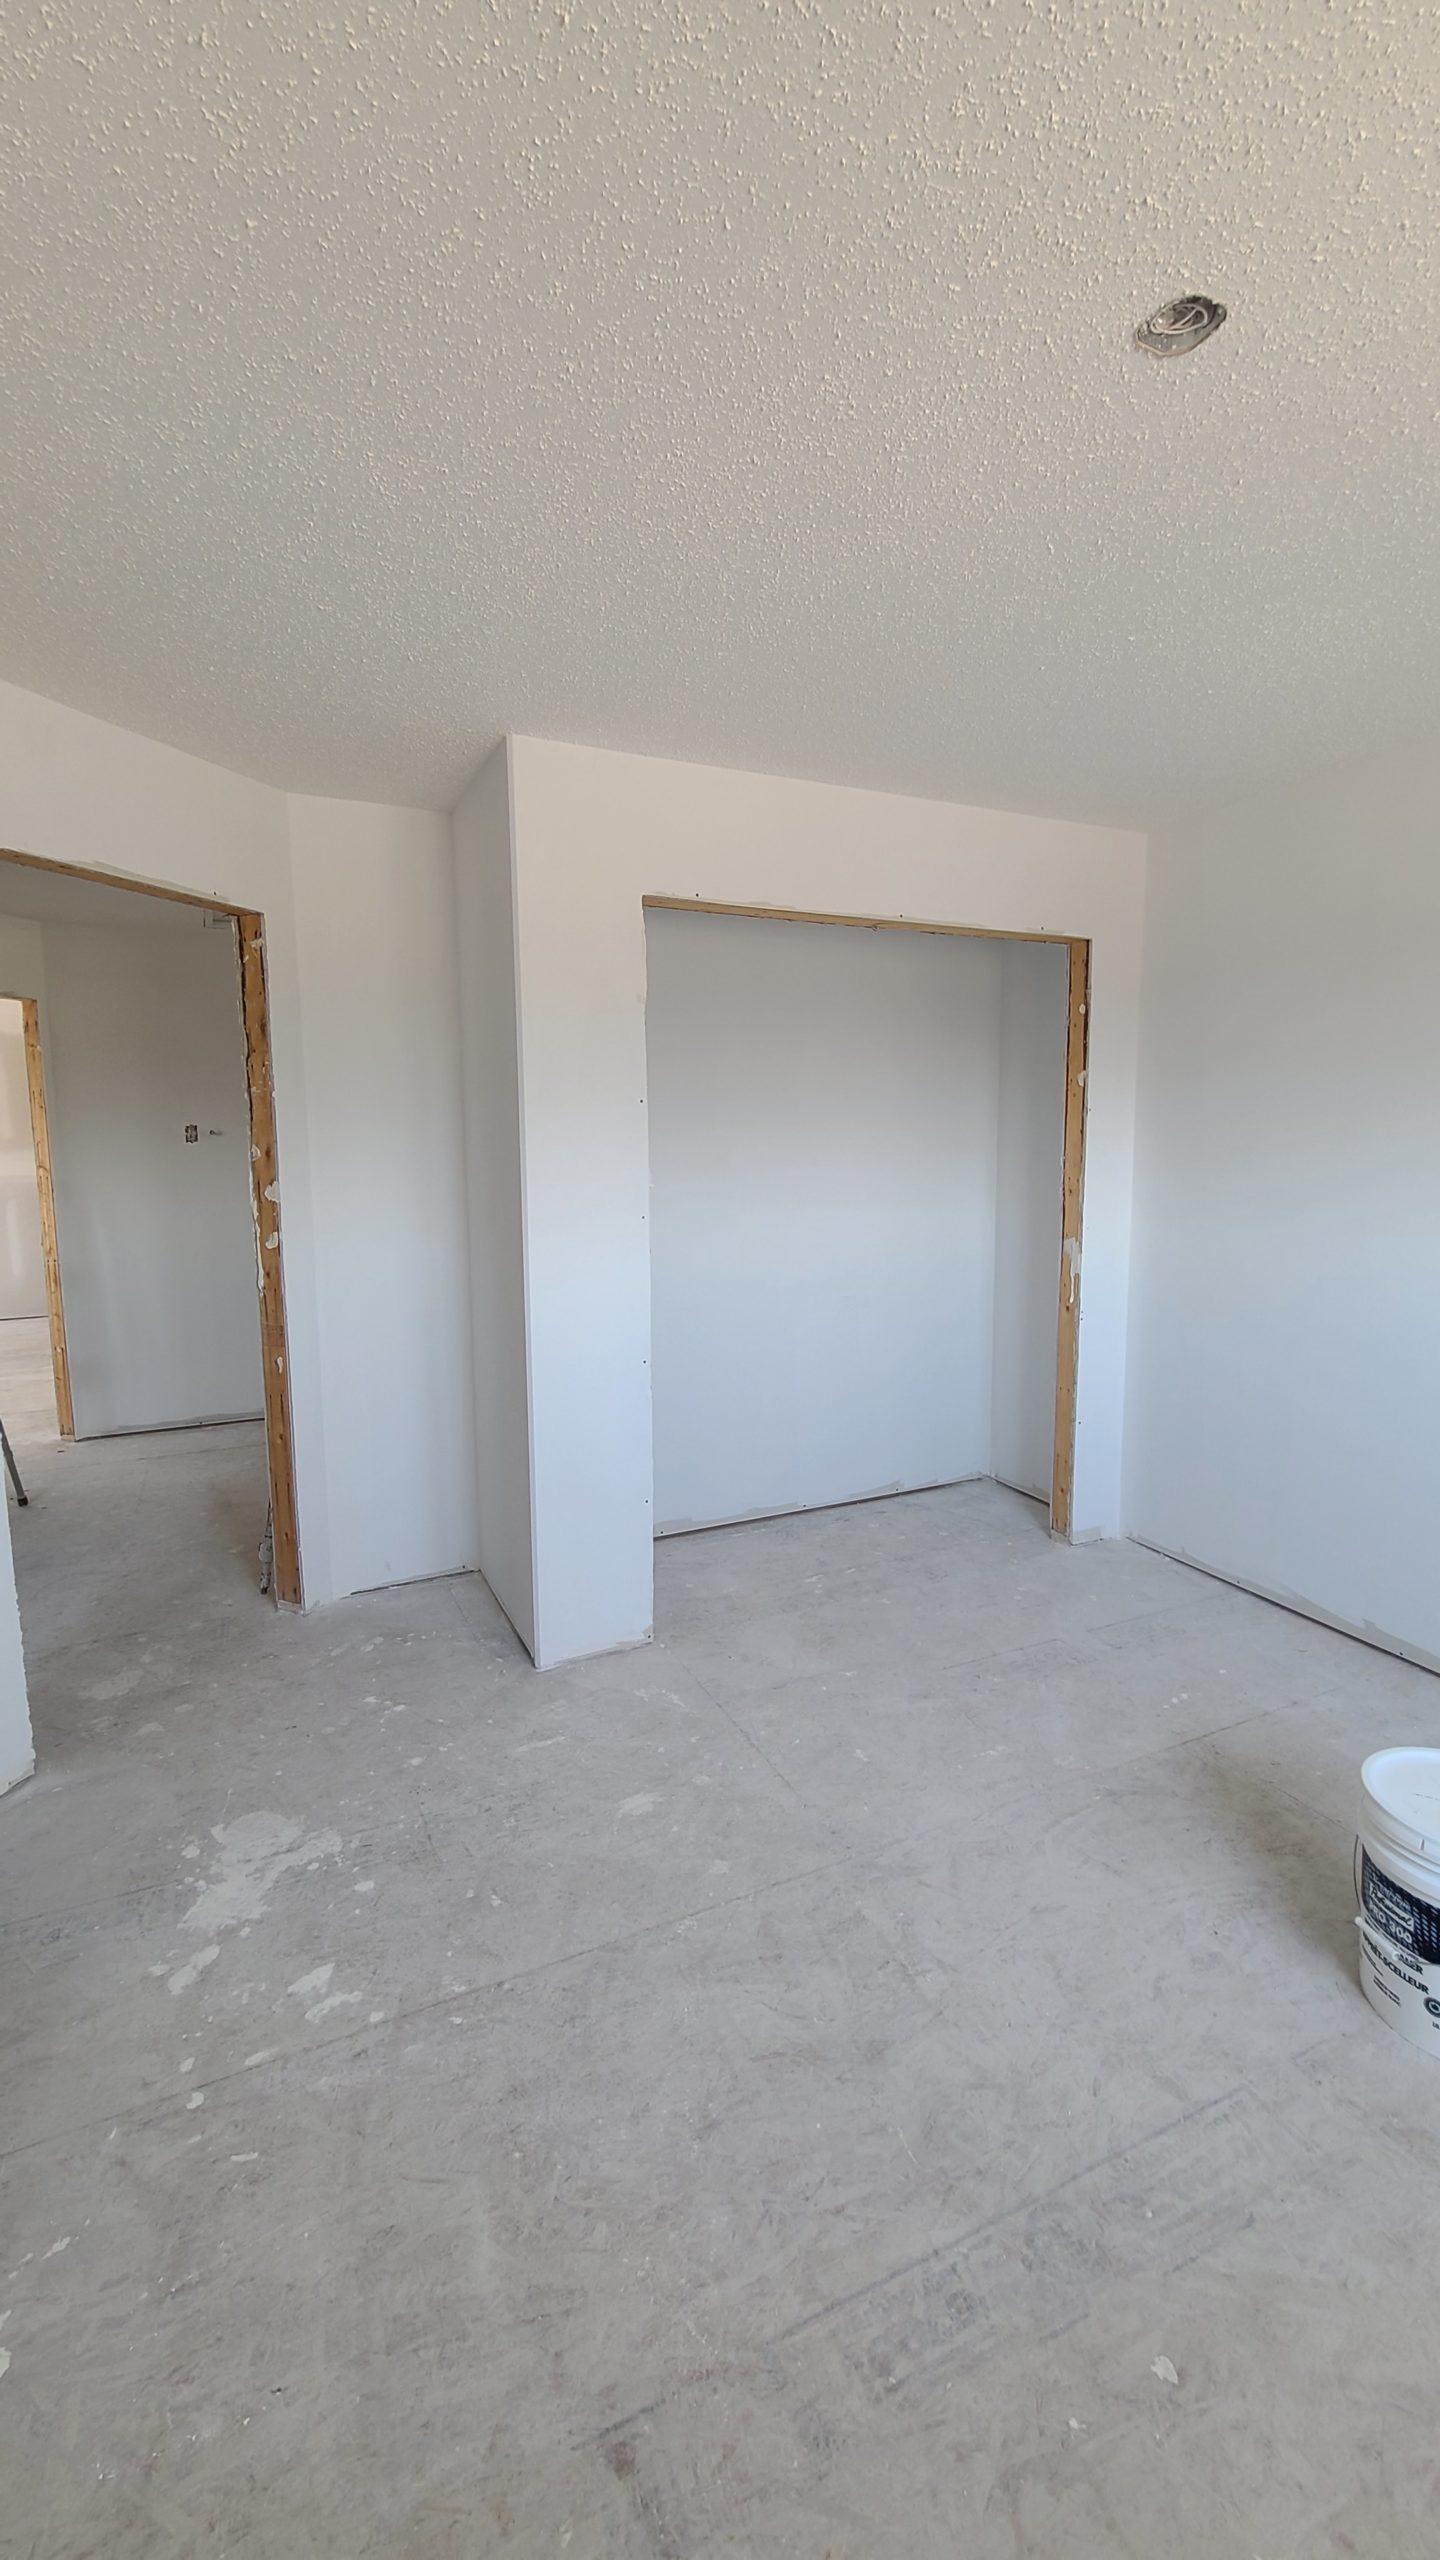 Spare Bedroom - Closet RTM under construction